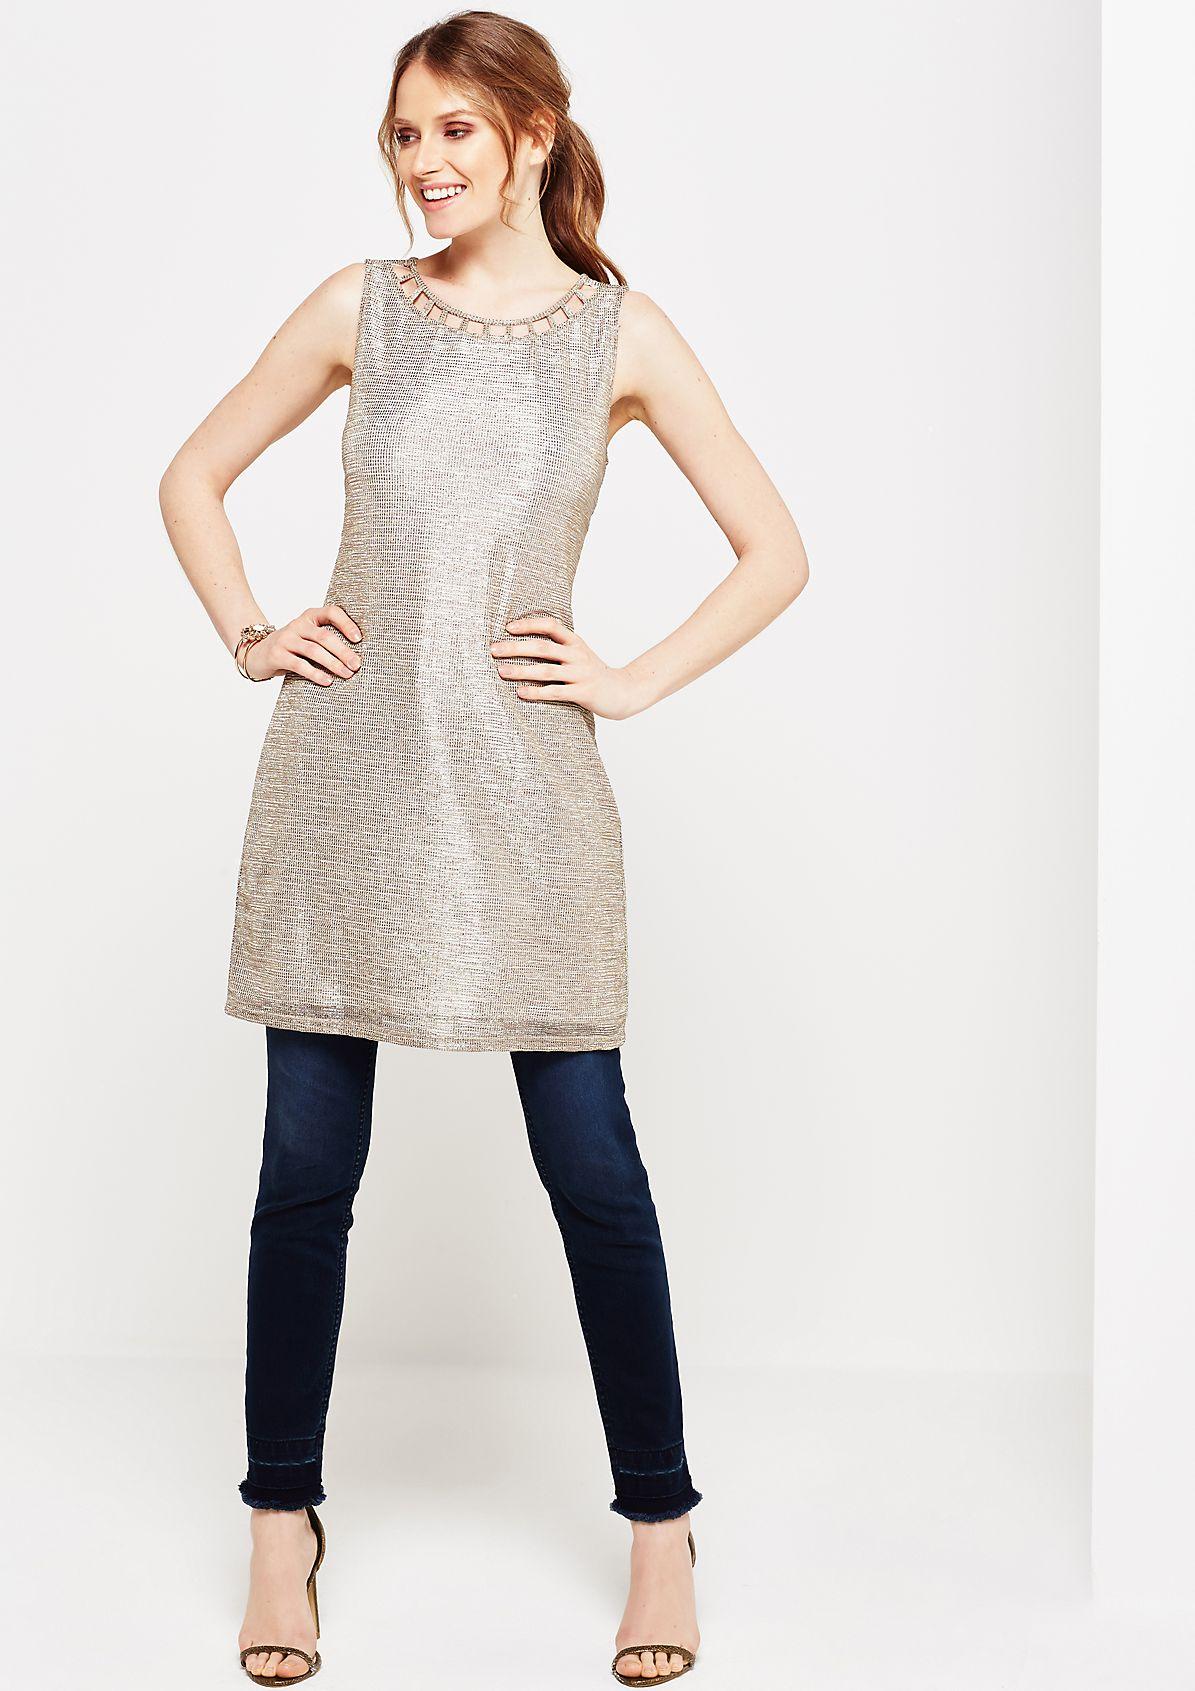 Glamouröses Abendkleid aus goldglänzenden Metallfasern